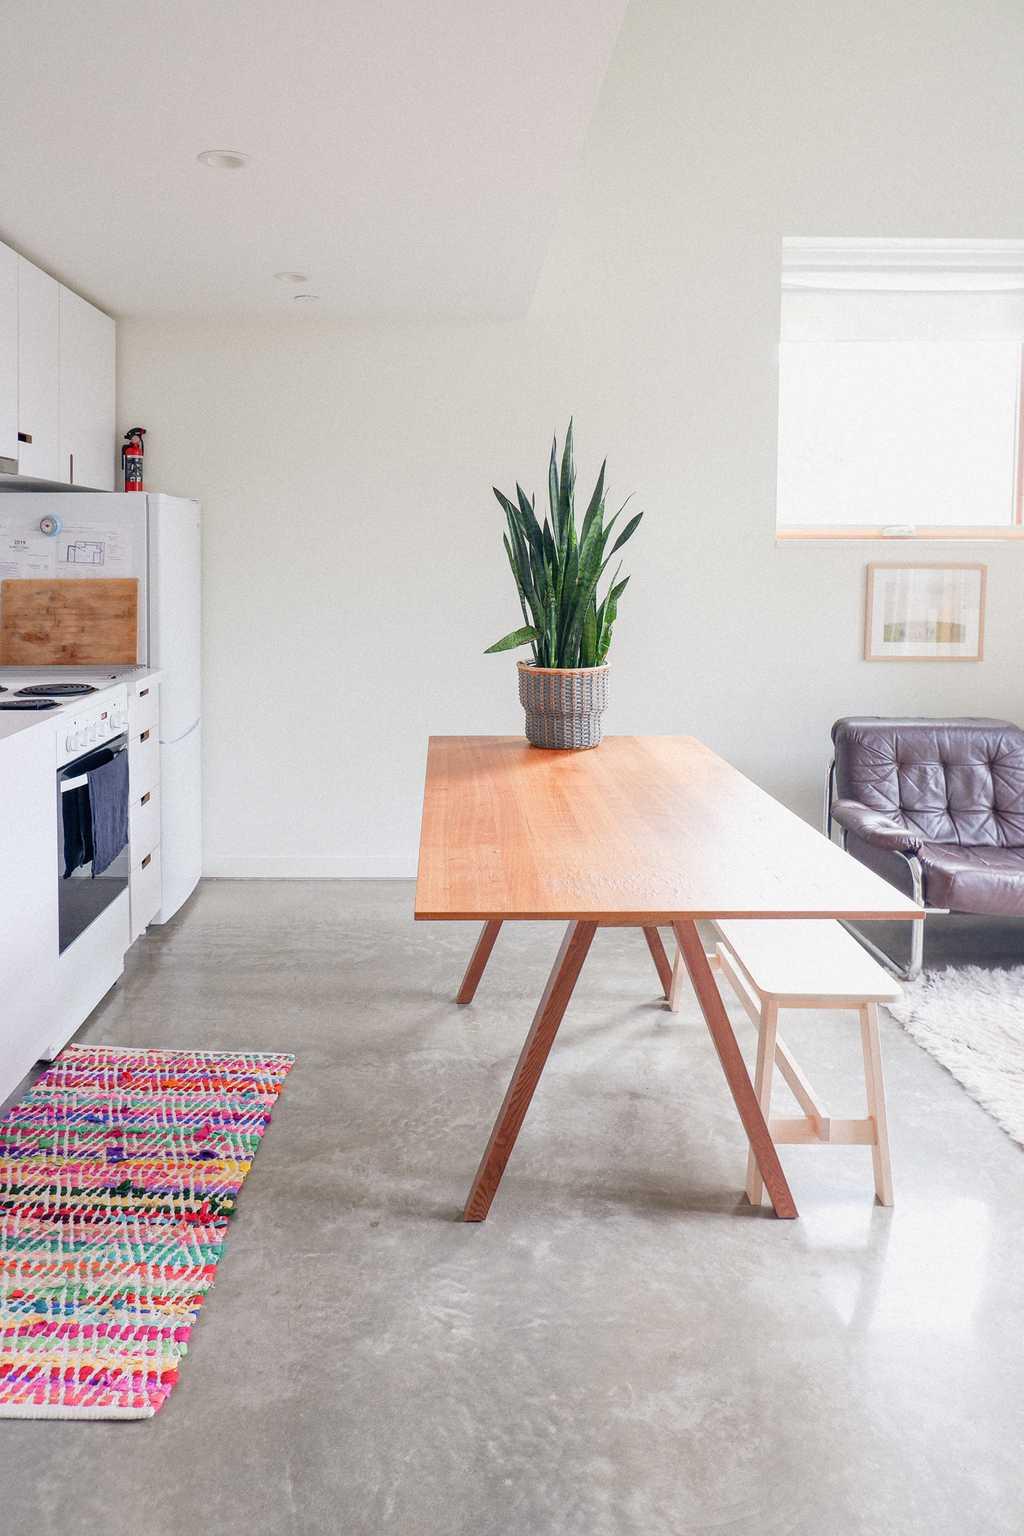 Kitchen area in Airbnb Rental